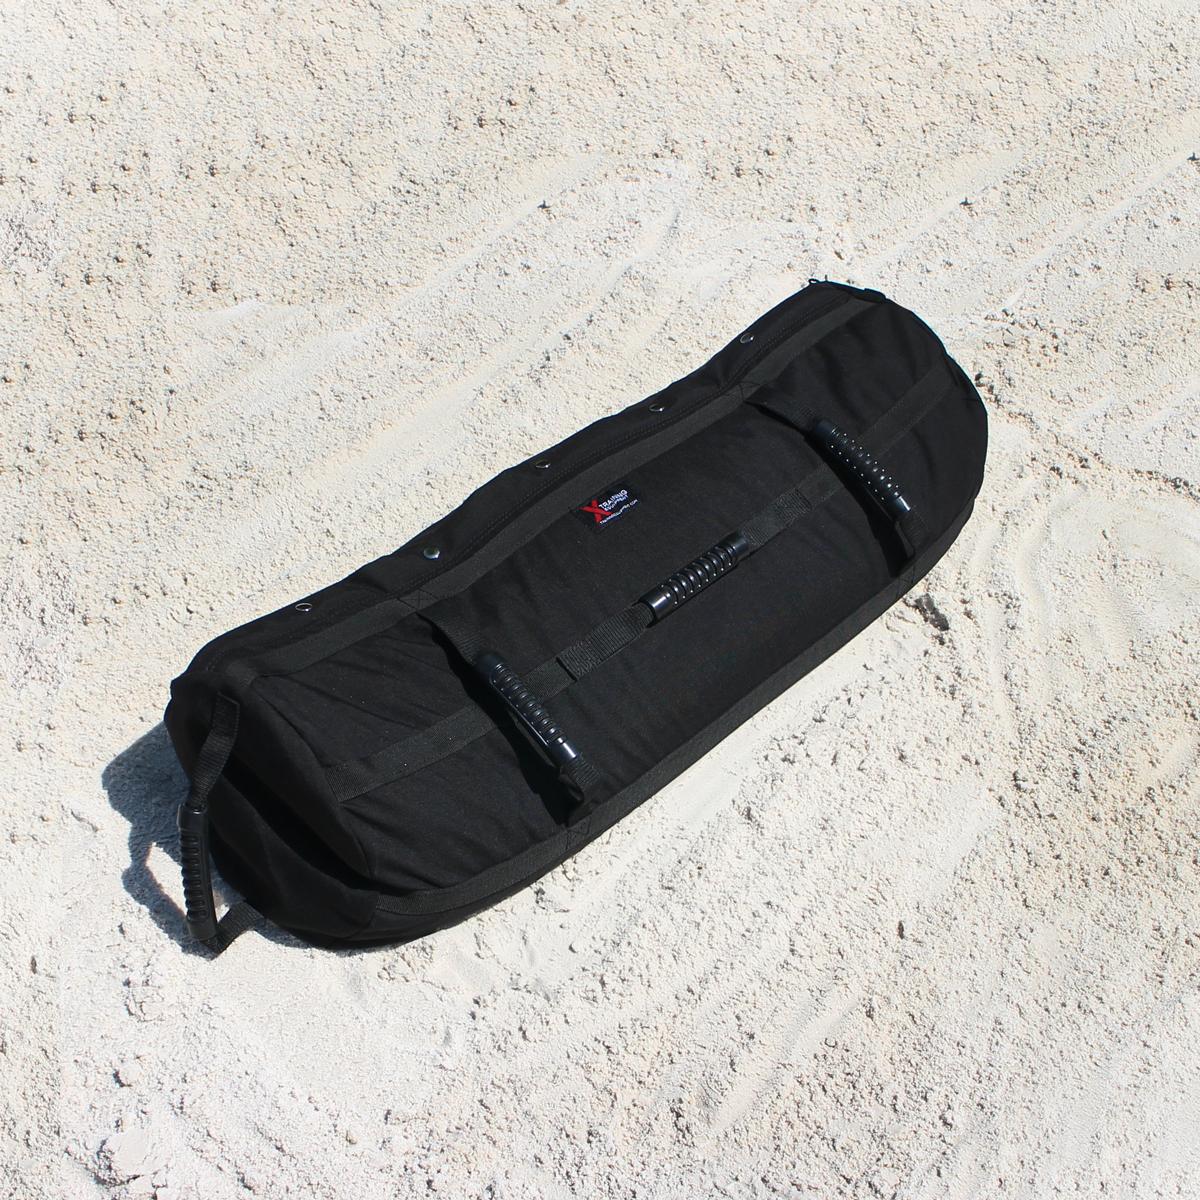 Sandbag Trainer - Large - 100LB Kit - Pre-Order Now - ETA March 3rd